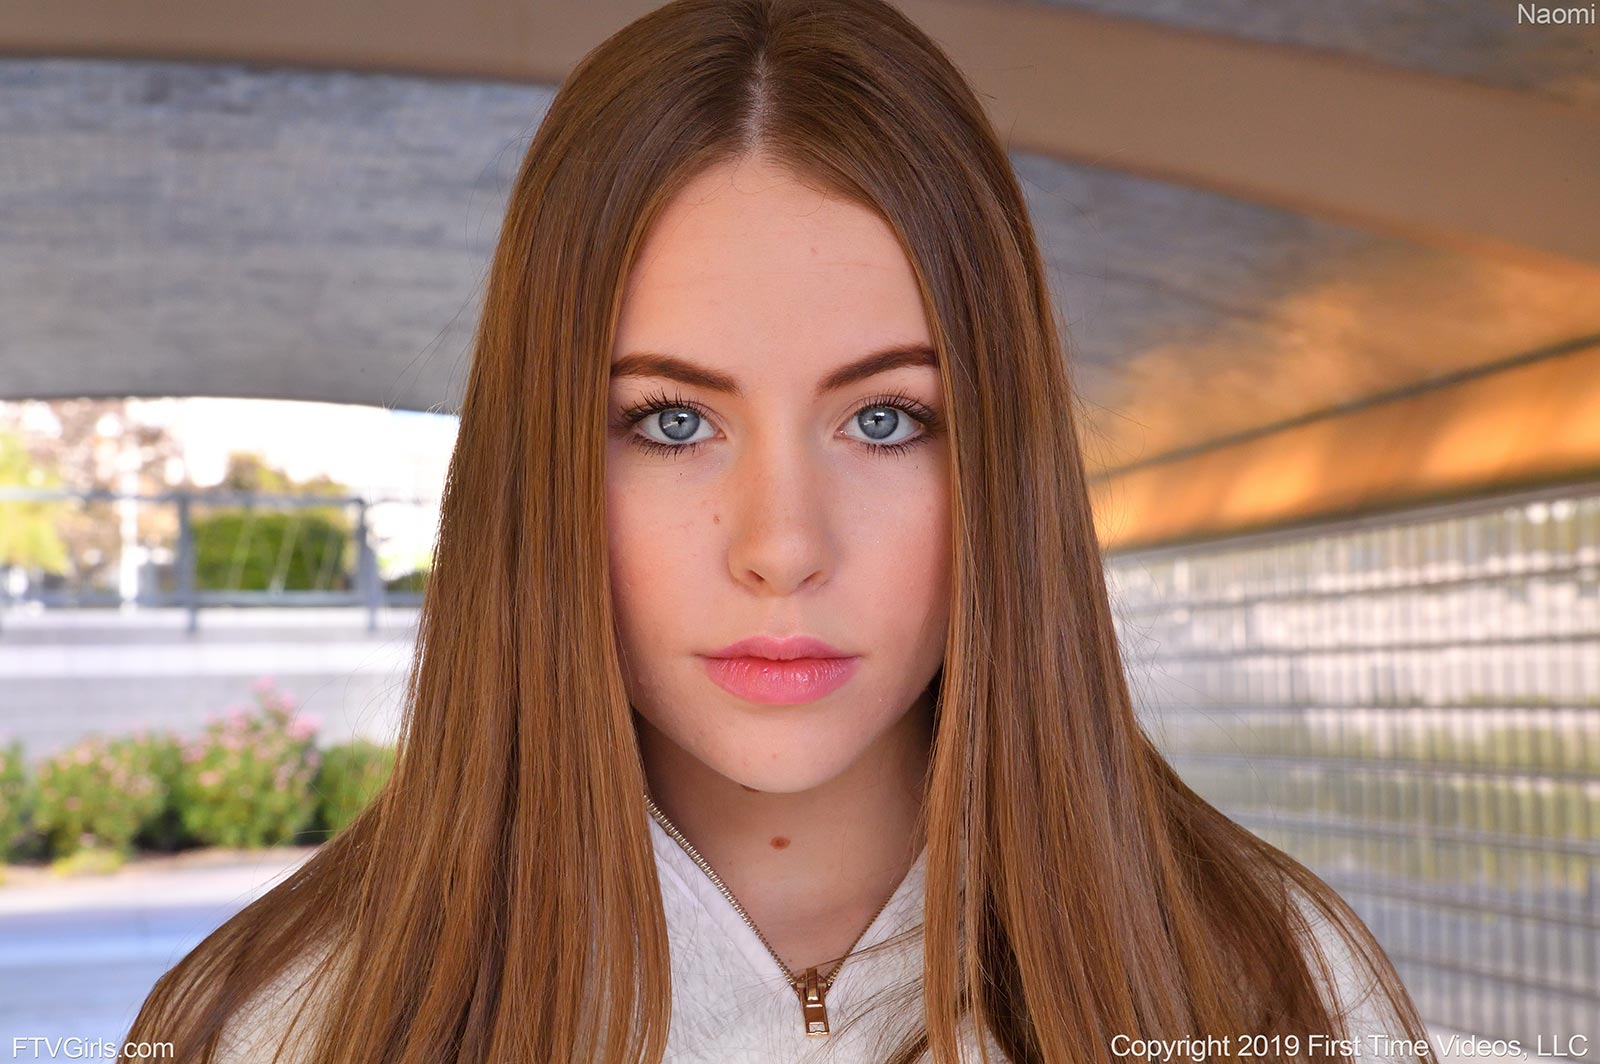 Naomi Blue Twitter